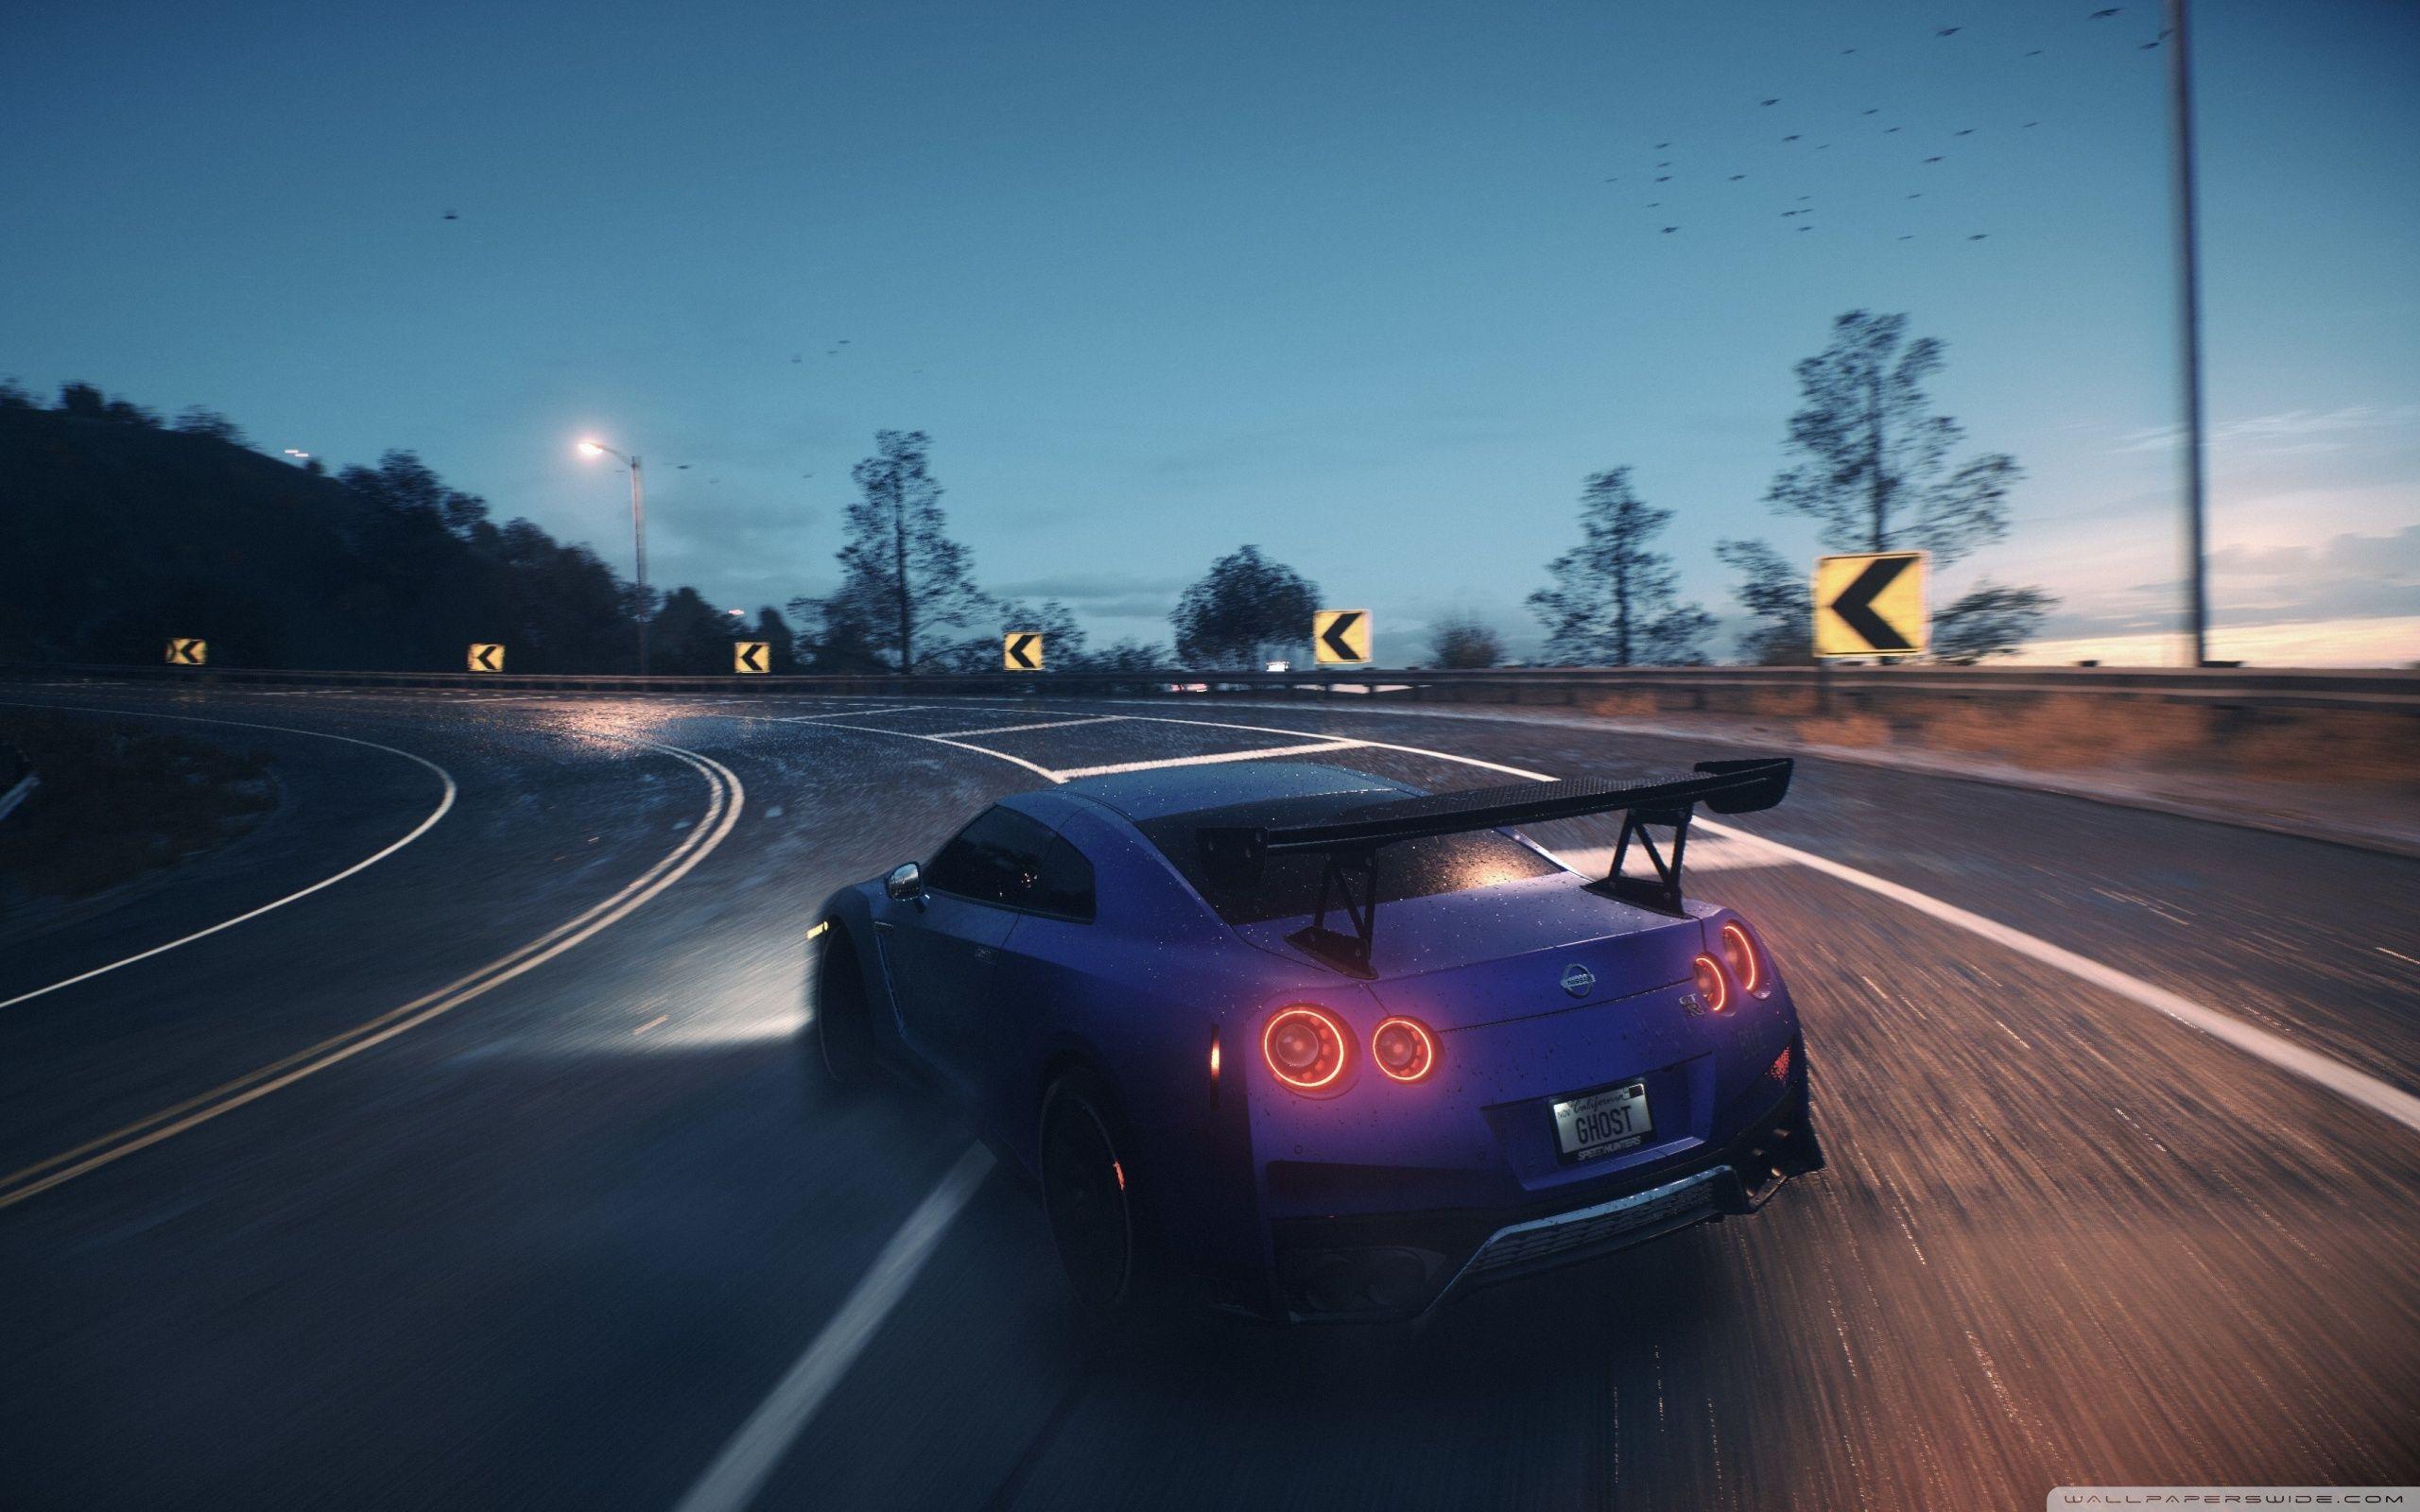 Need For Speed 2015 Wallpaper Hd Wallpaper 2015 Wallpaper Most